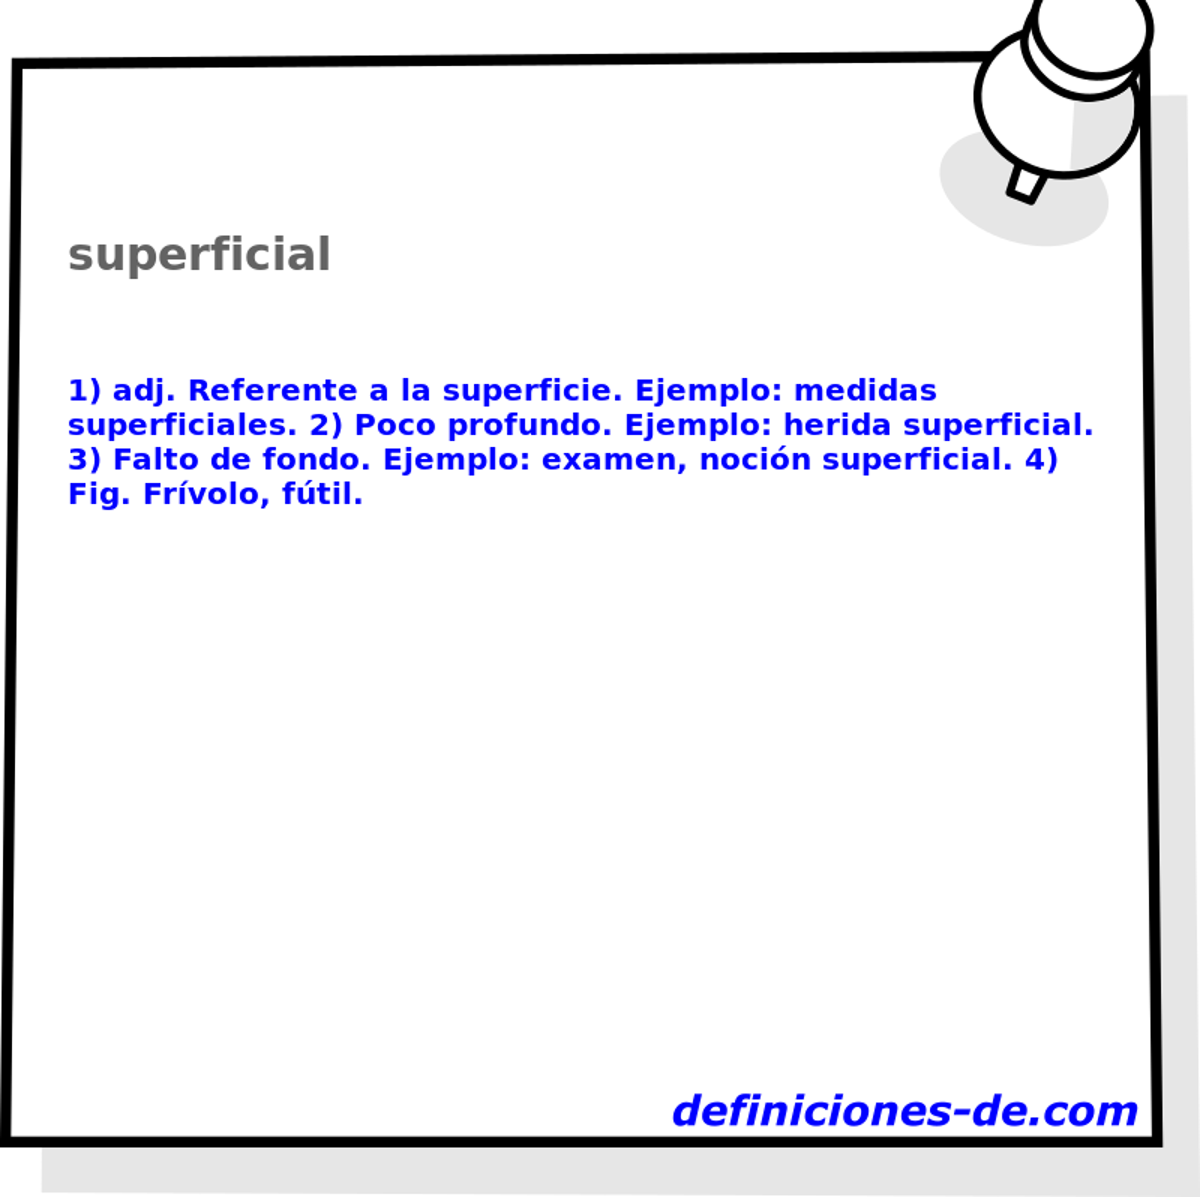 Qué significa Superficial?